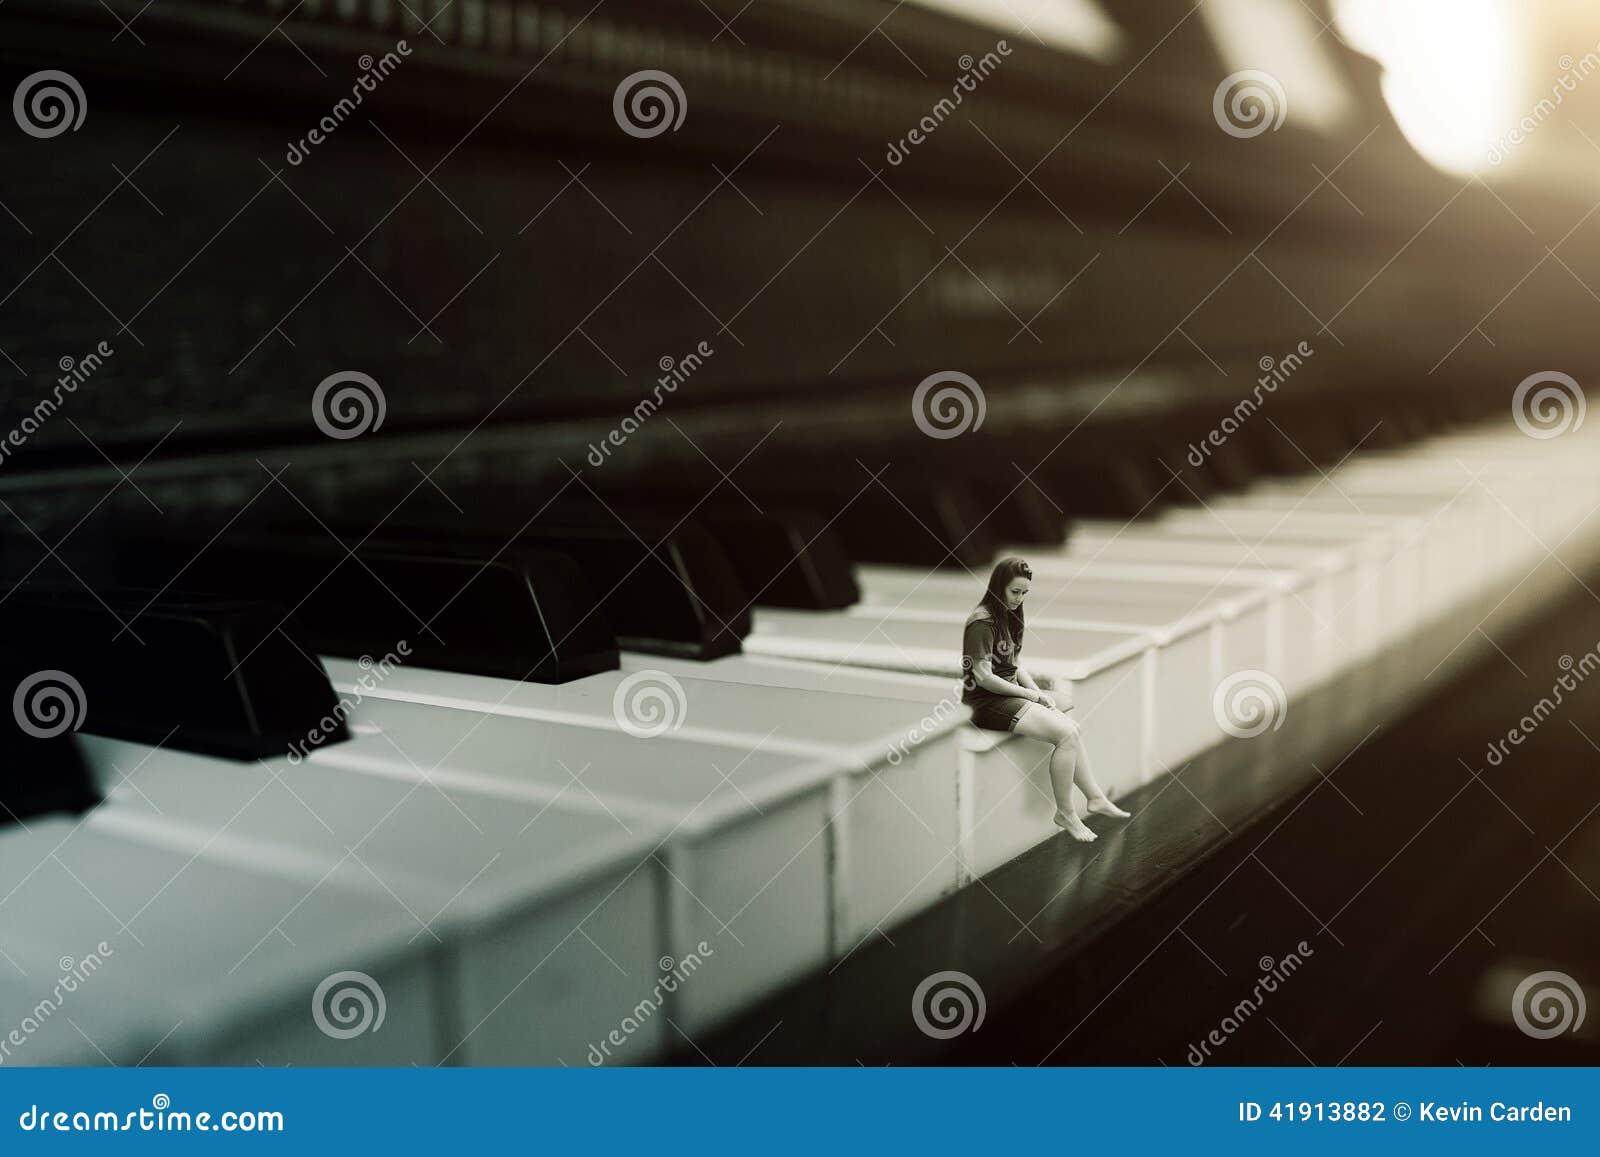 Apenas no piano